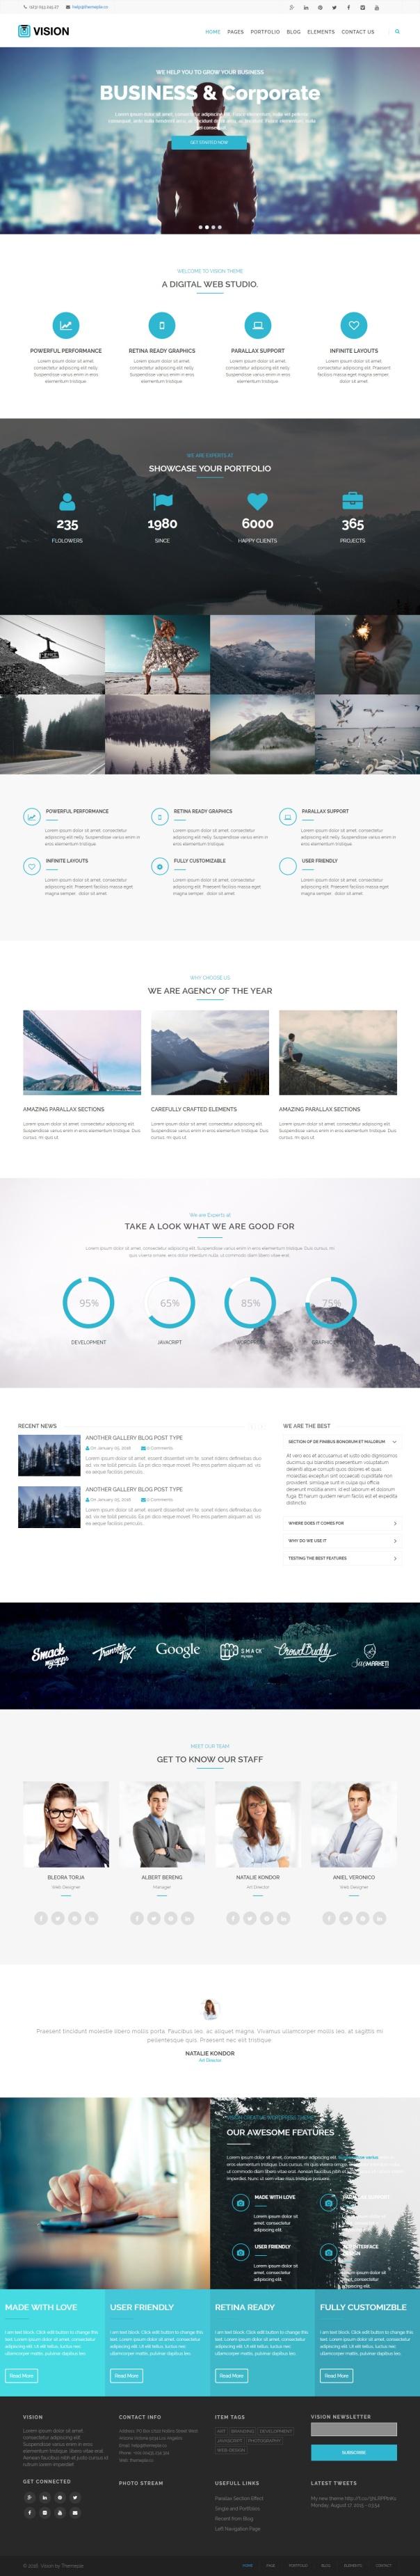 vision-d-drupal-responsive-theme-desktop-full